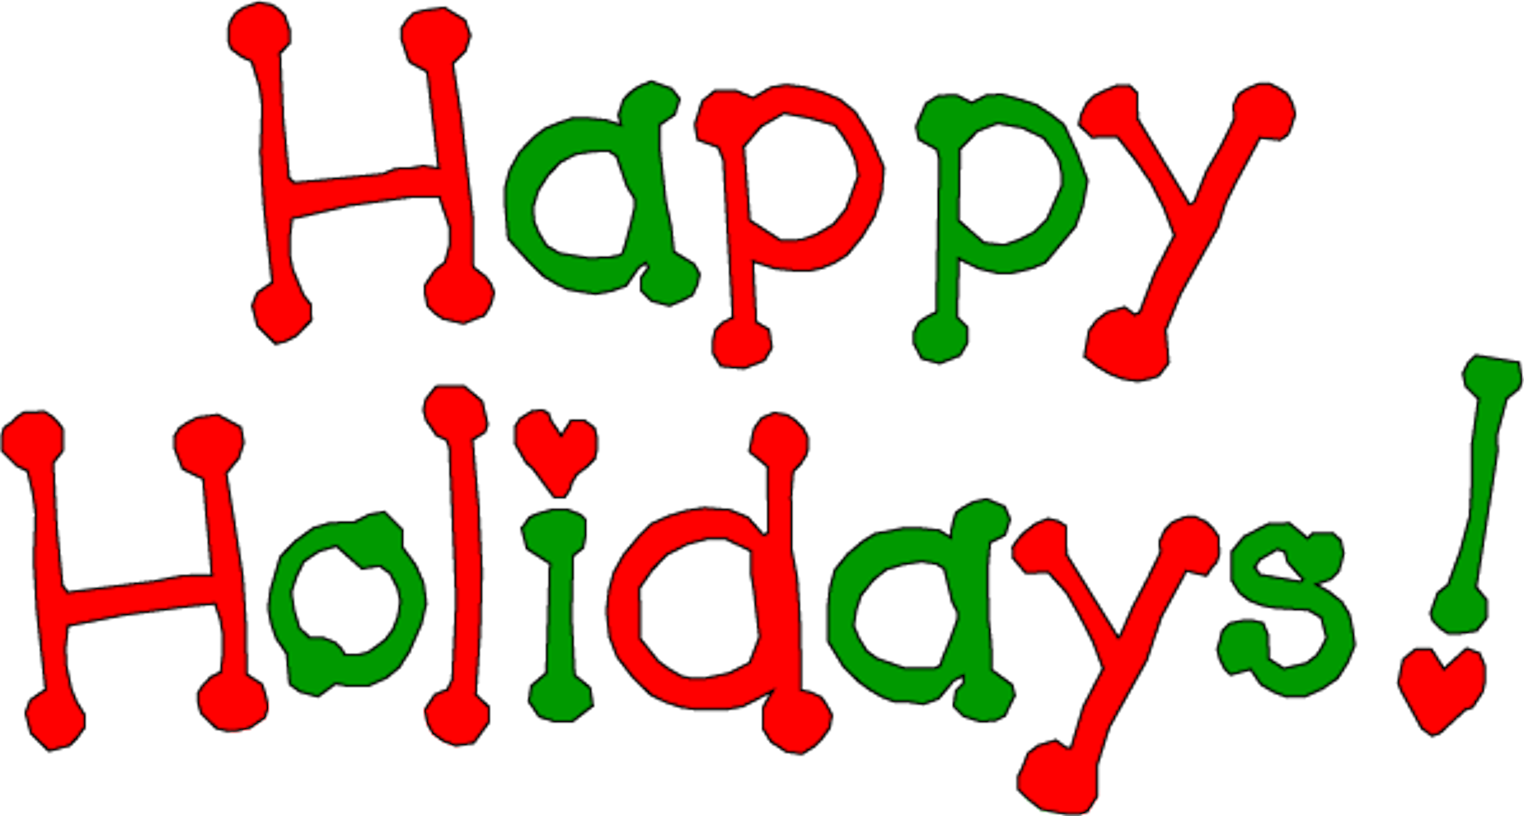 Canadian mortgage warehouse happy. Holiday clipart holiday season